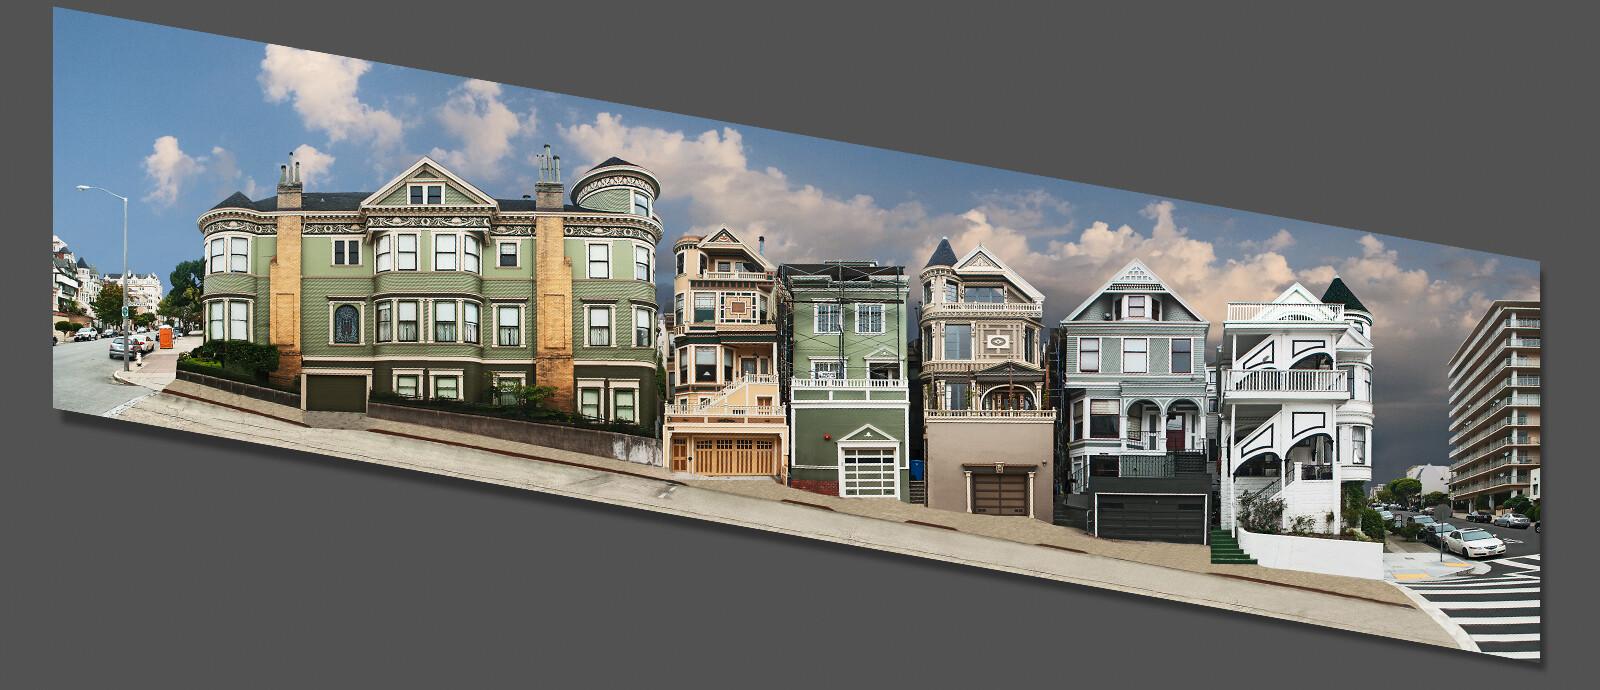 San Francisco, Octavia Street  - Larry Yust